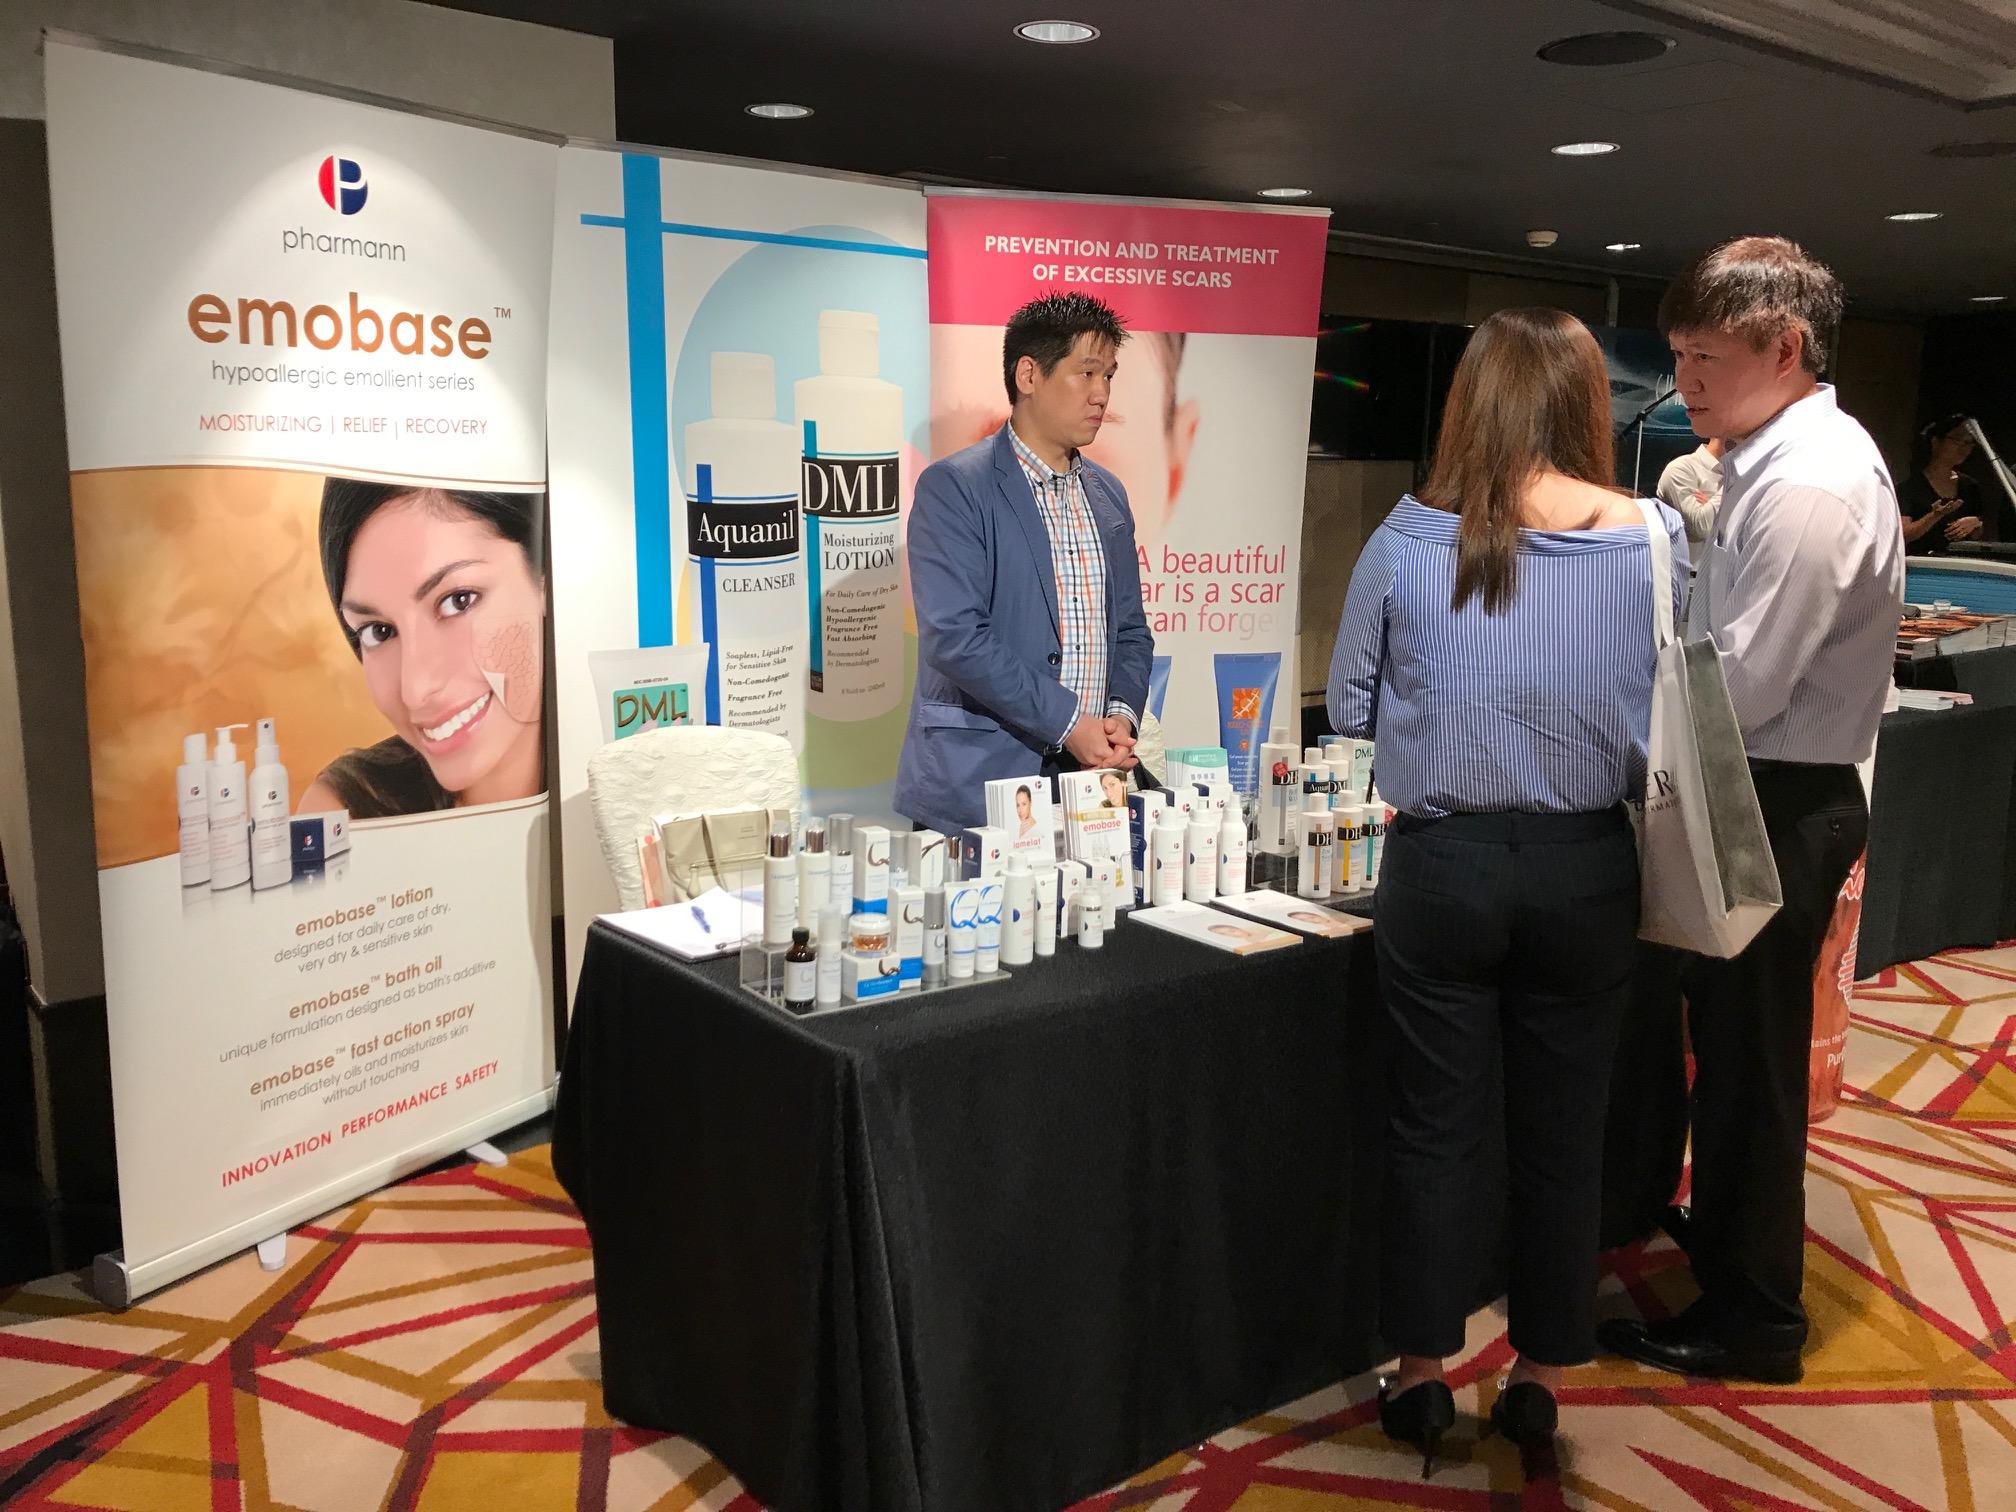 dermatology-conference1.jpg